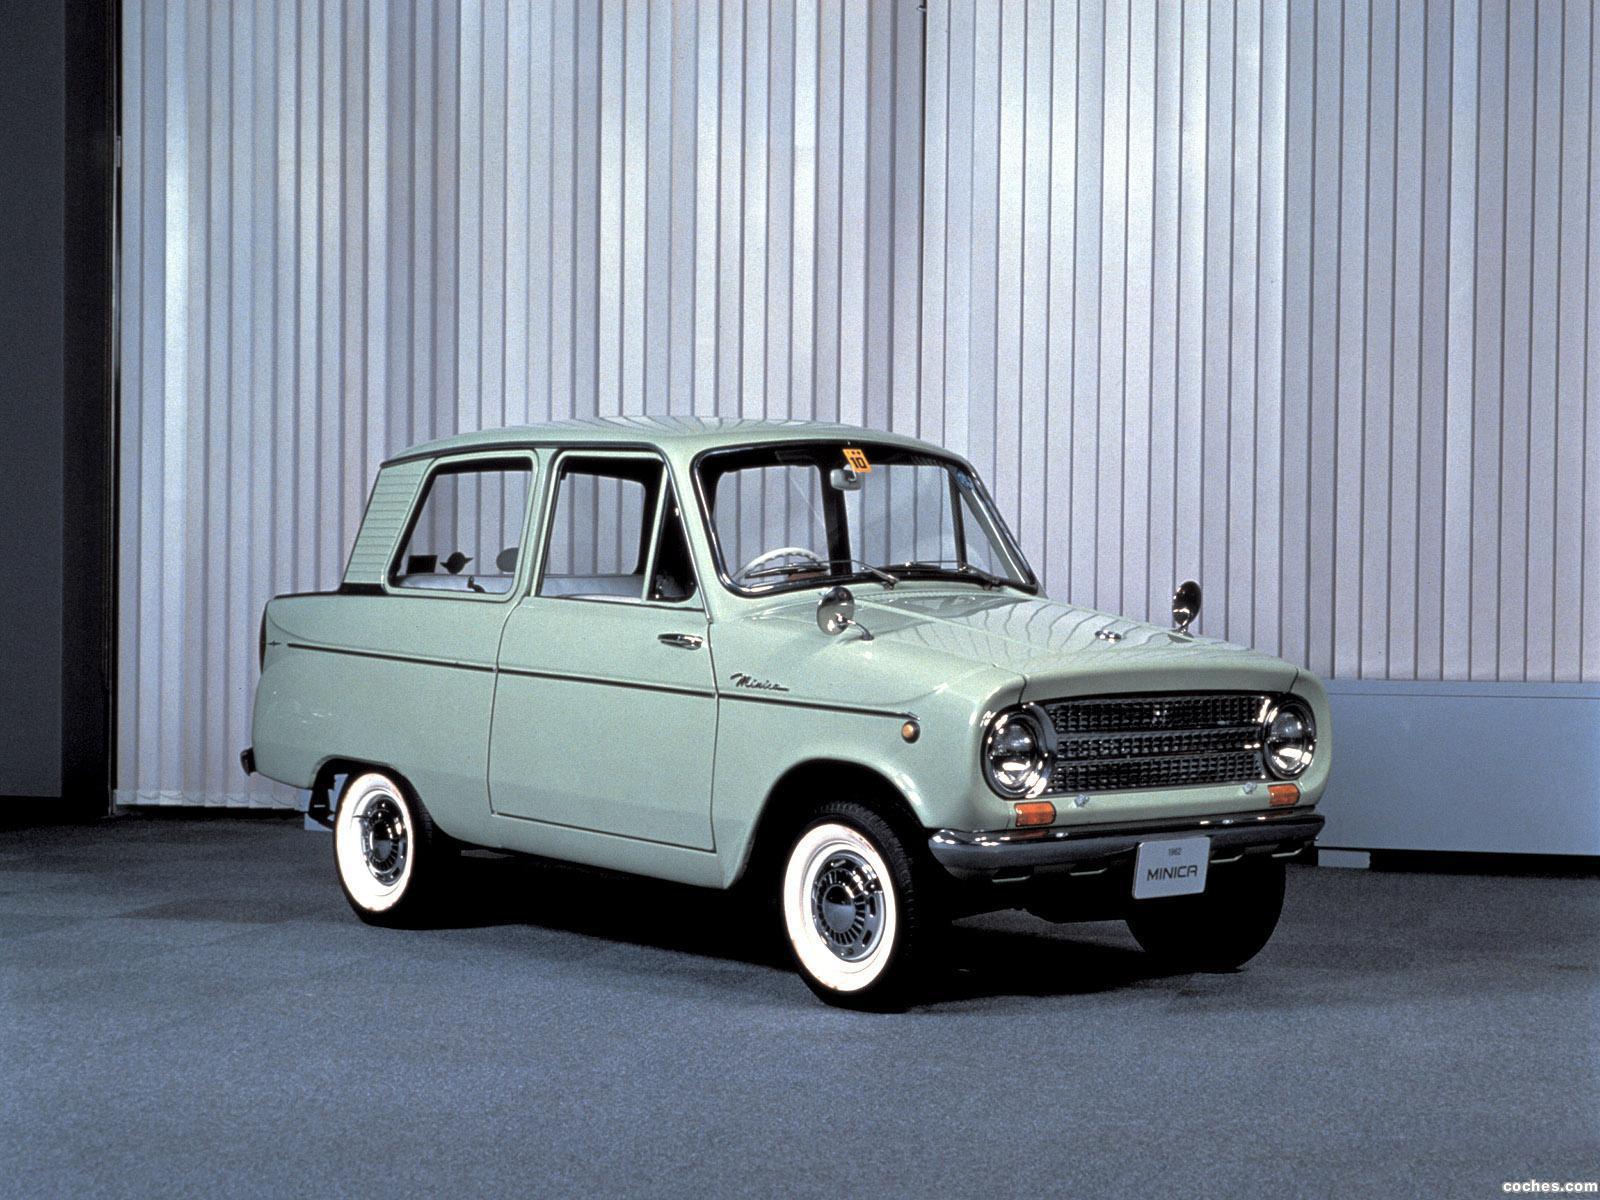 Foto 0 de Mitsubishi Minica 1962